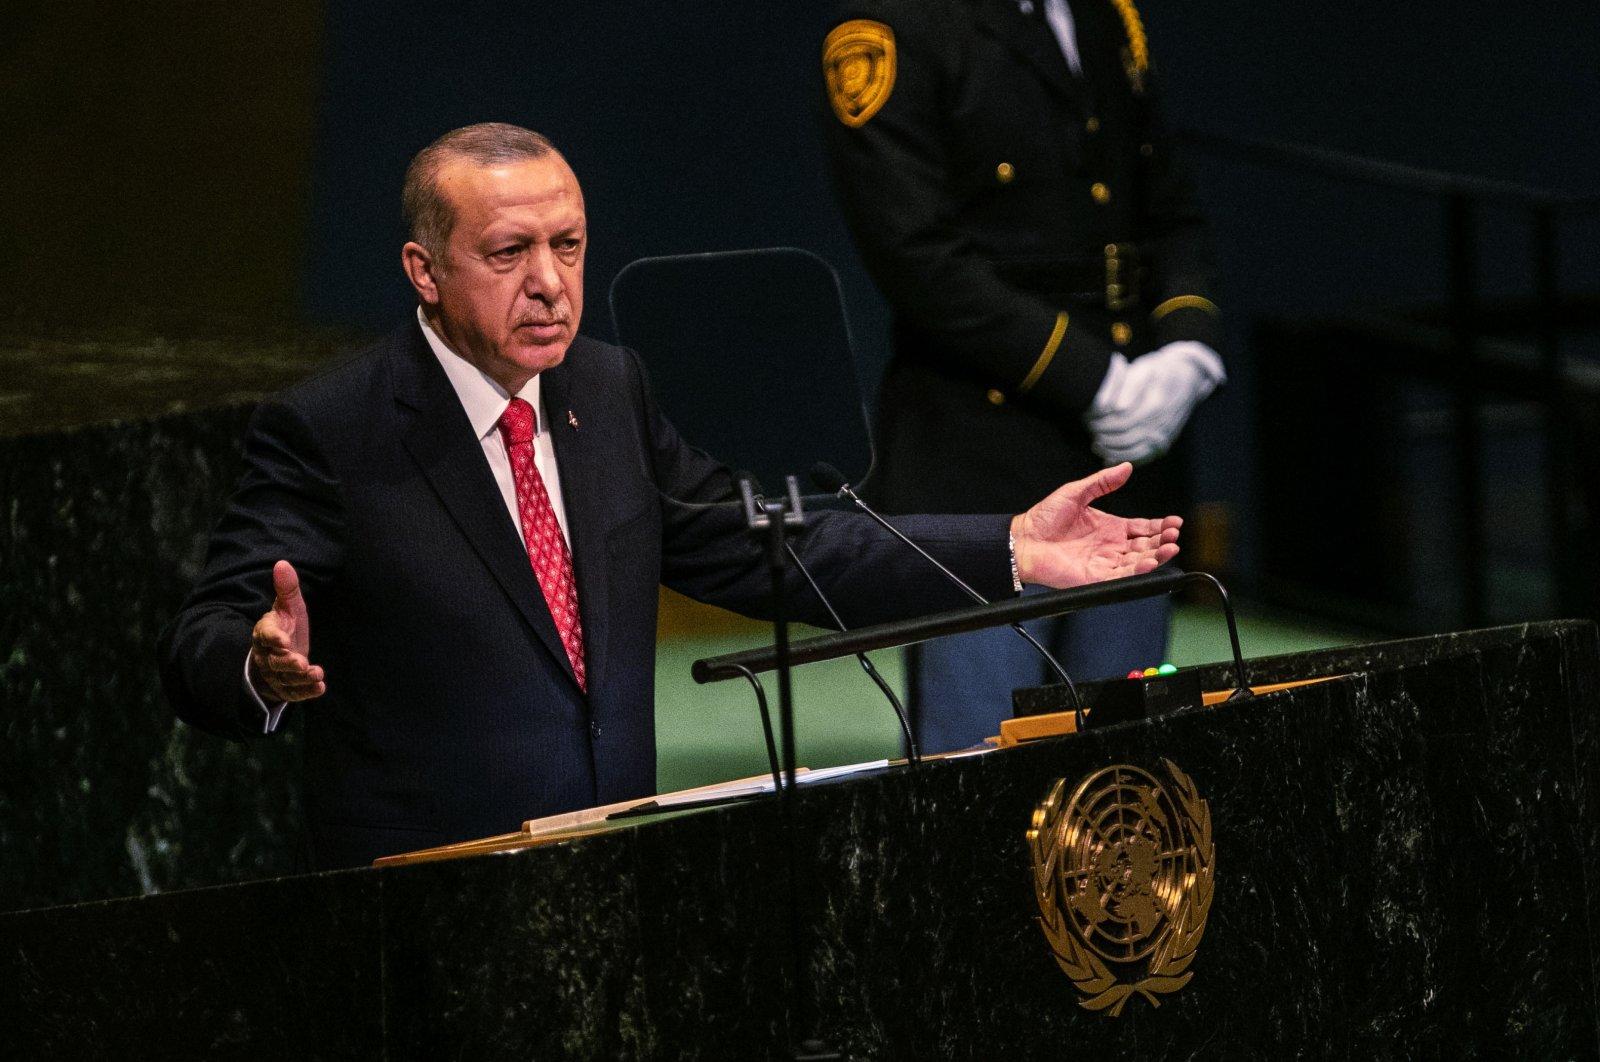 President Recep Tayyip Erdoğan speaks during the U.N. General Assembly meeting in New York, U.S., Sept. 25, 2018. (Getty Images Photo)